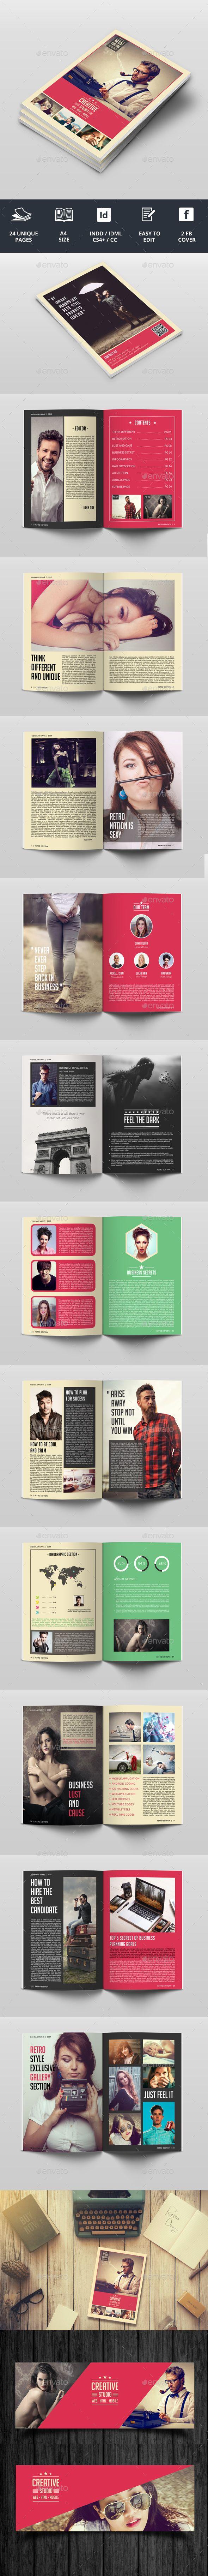 Best Newsletter Design Images On   Newsletter Design